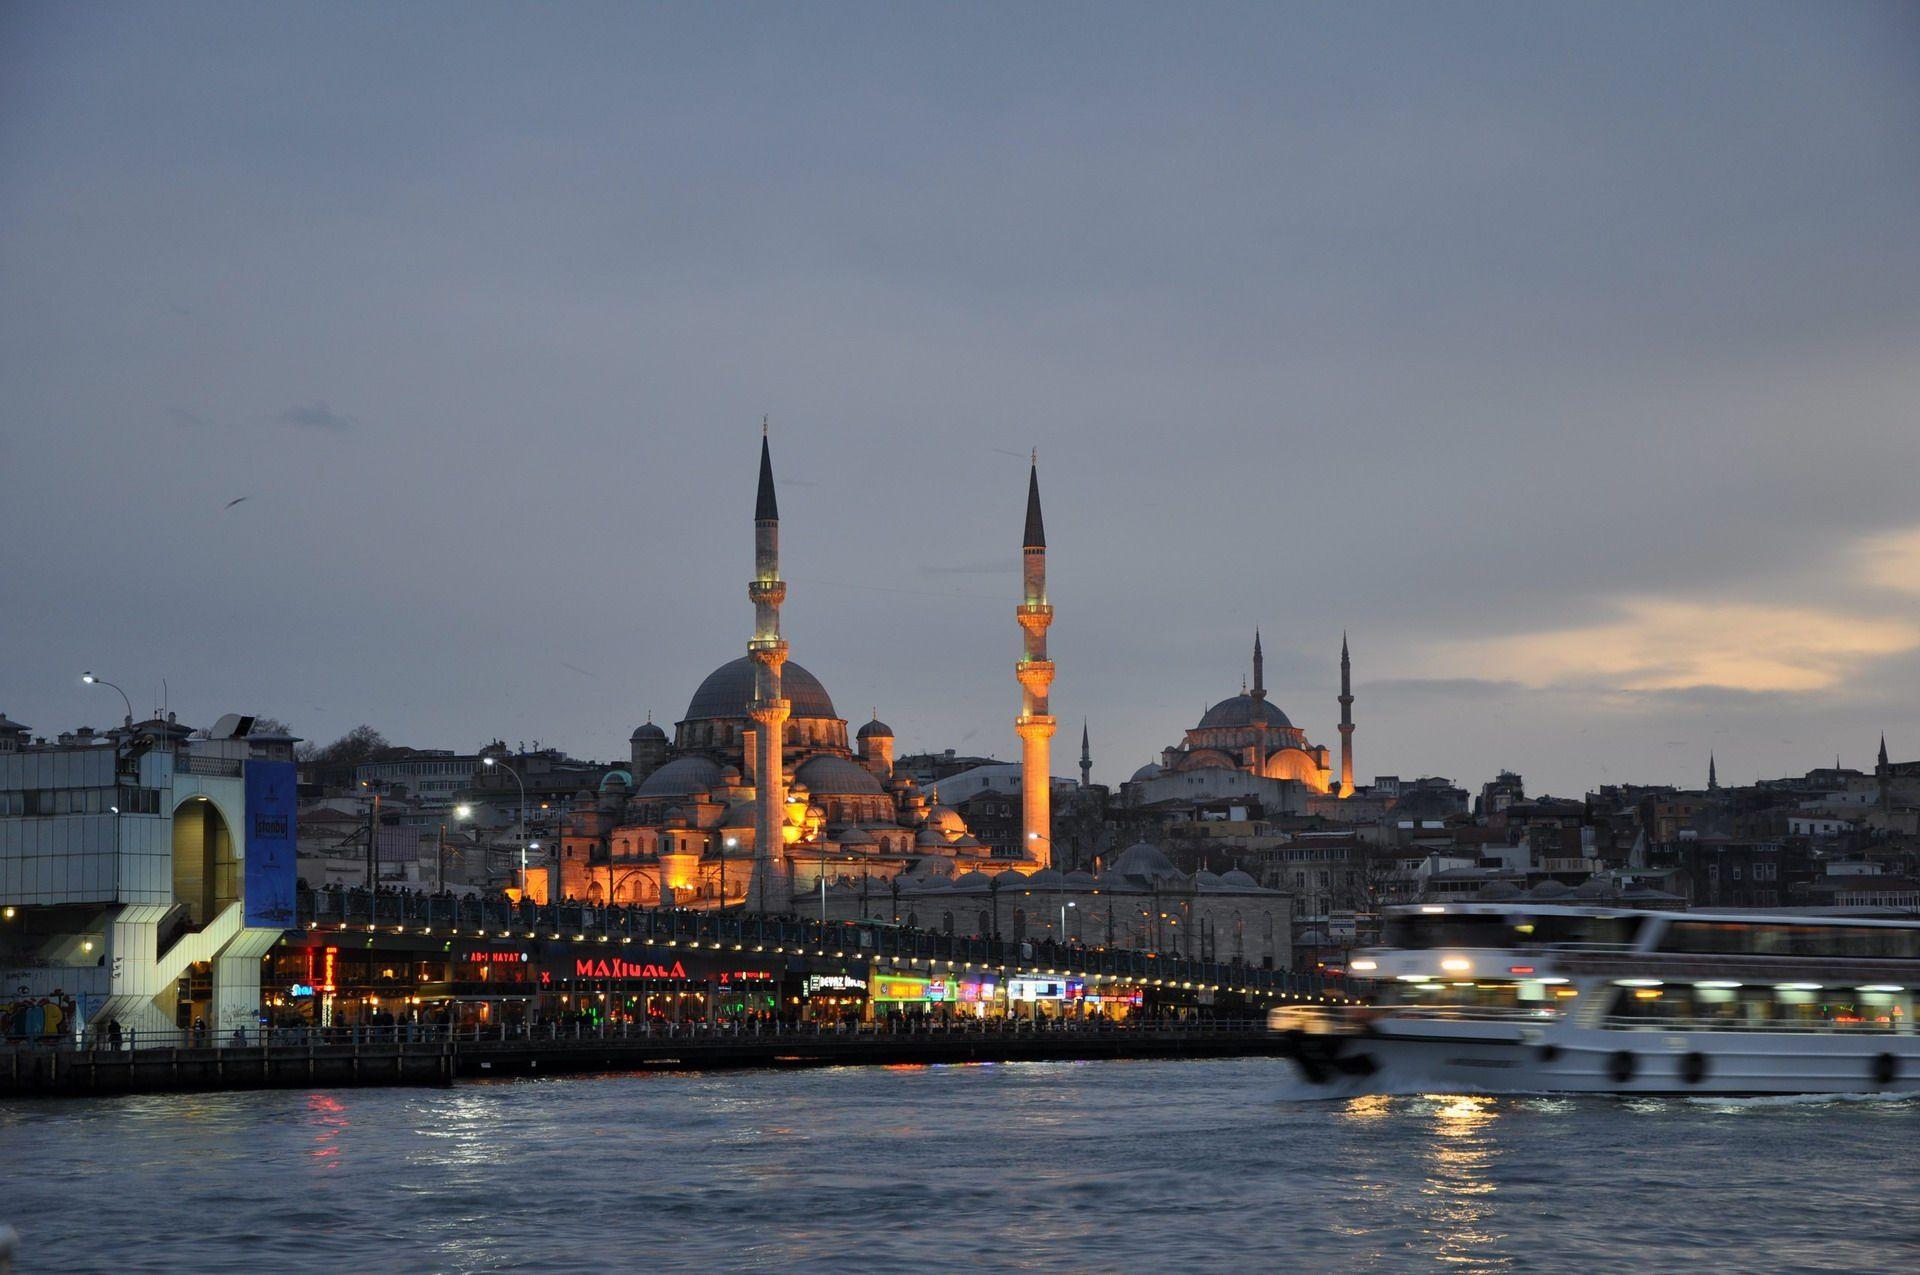 Istanbul Turkey Turkiye Wallpaper 060 Istanbul Turkiye Turkey Bogazicikoprusu Sultanahmetcamii Ayasofya Halic Bosp Istanbul Istanbul Turkey Turkey